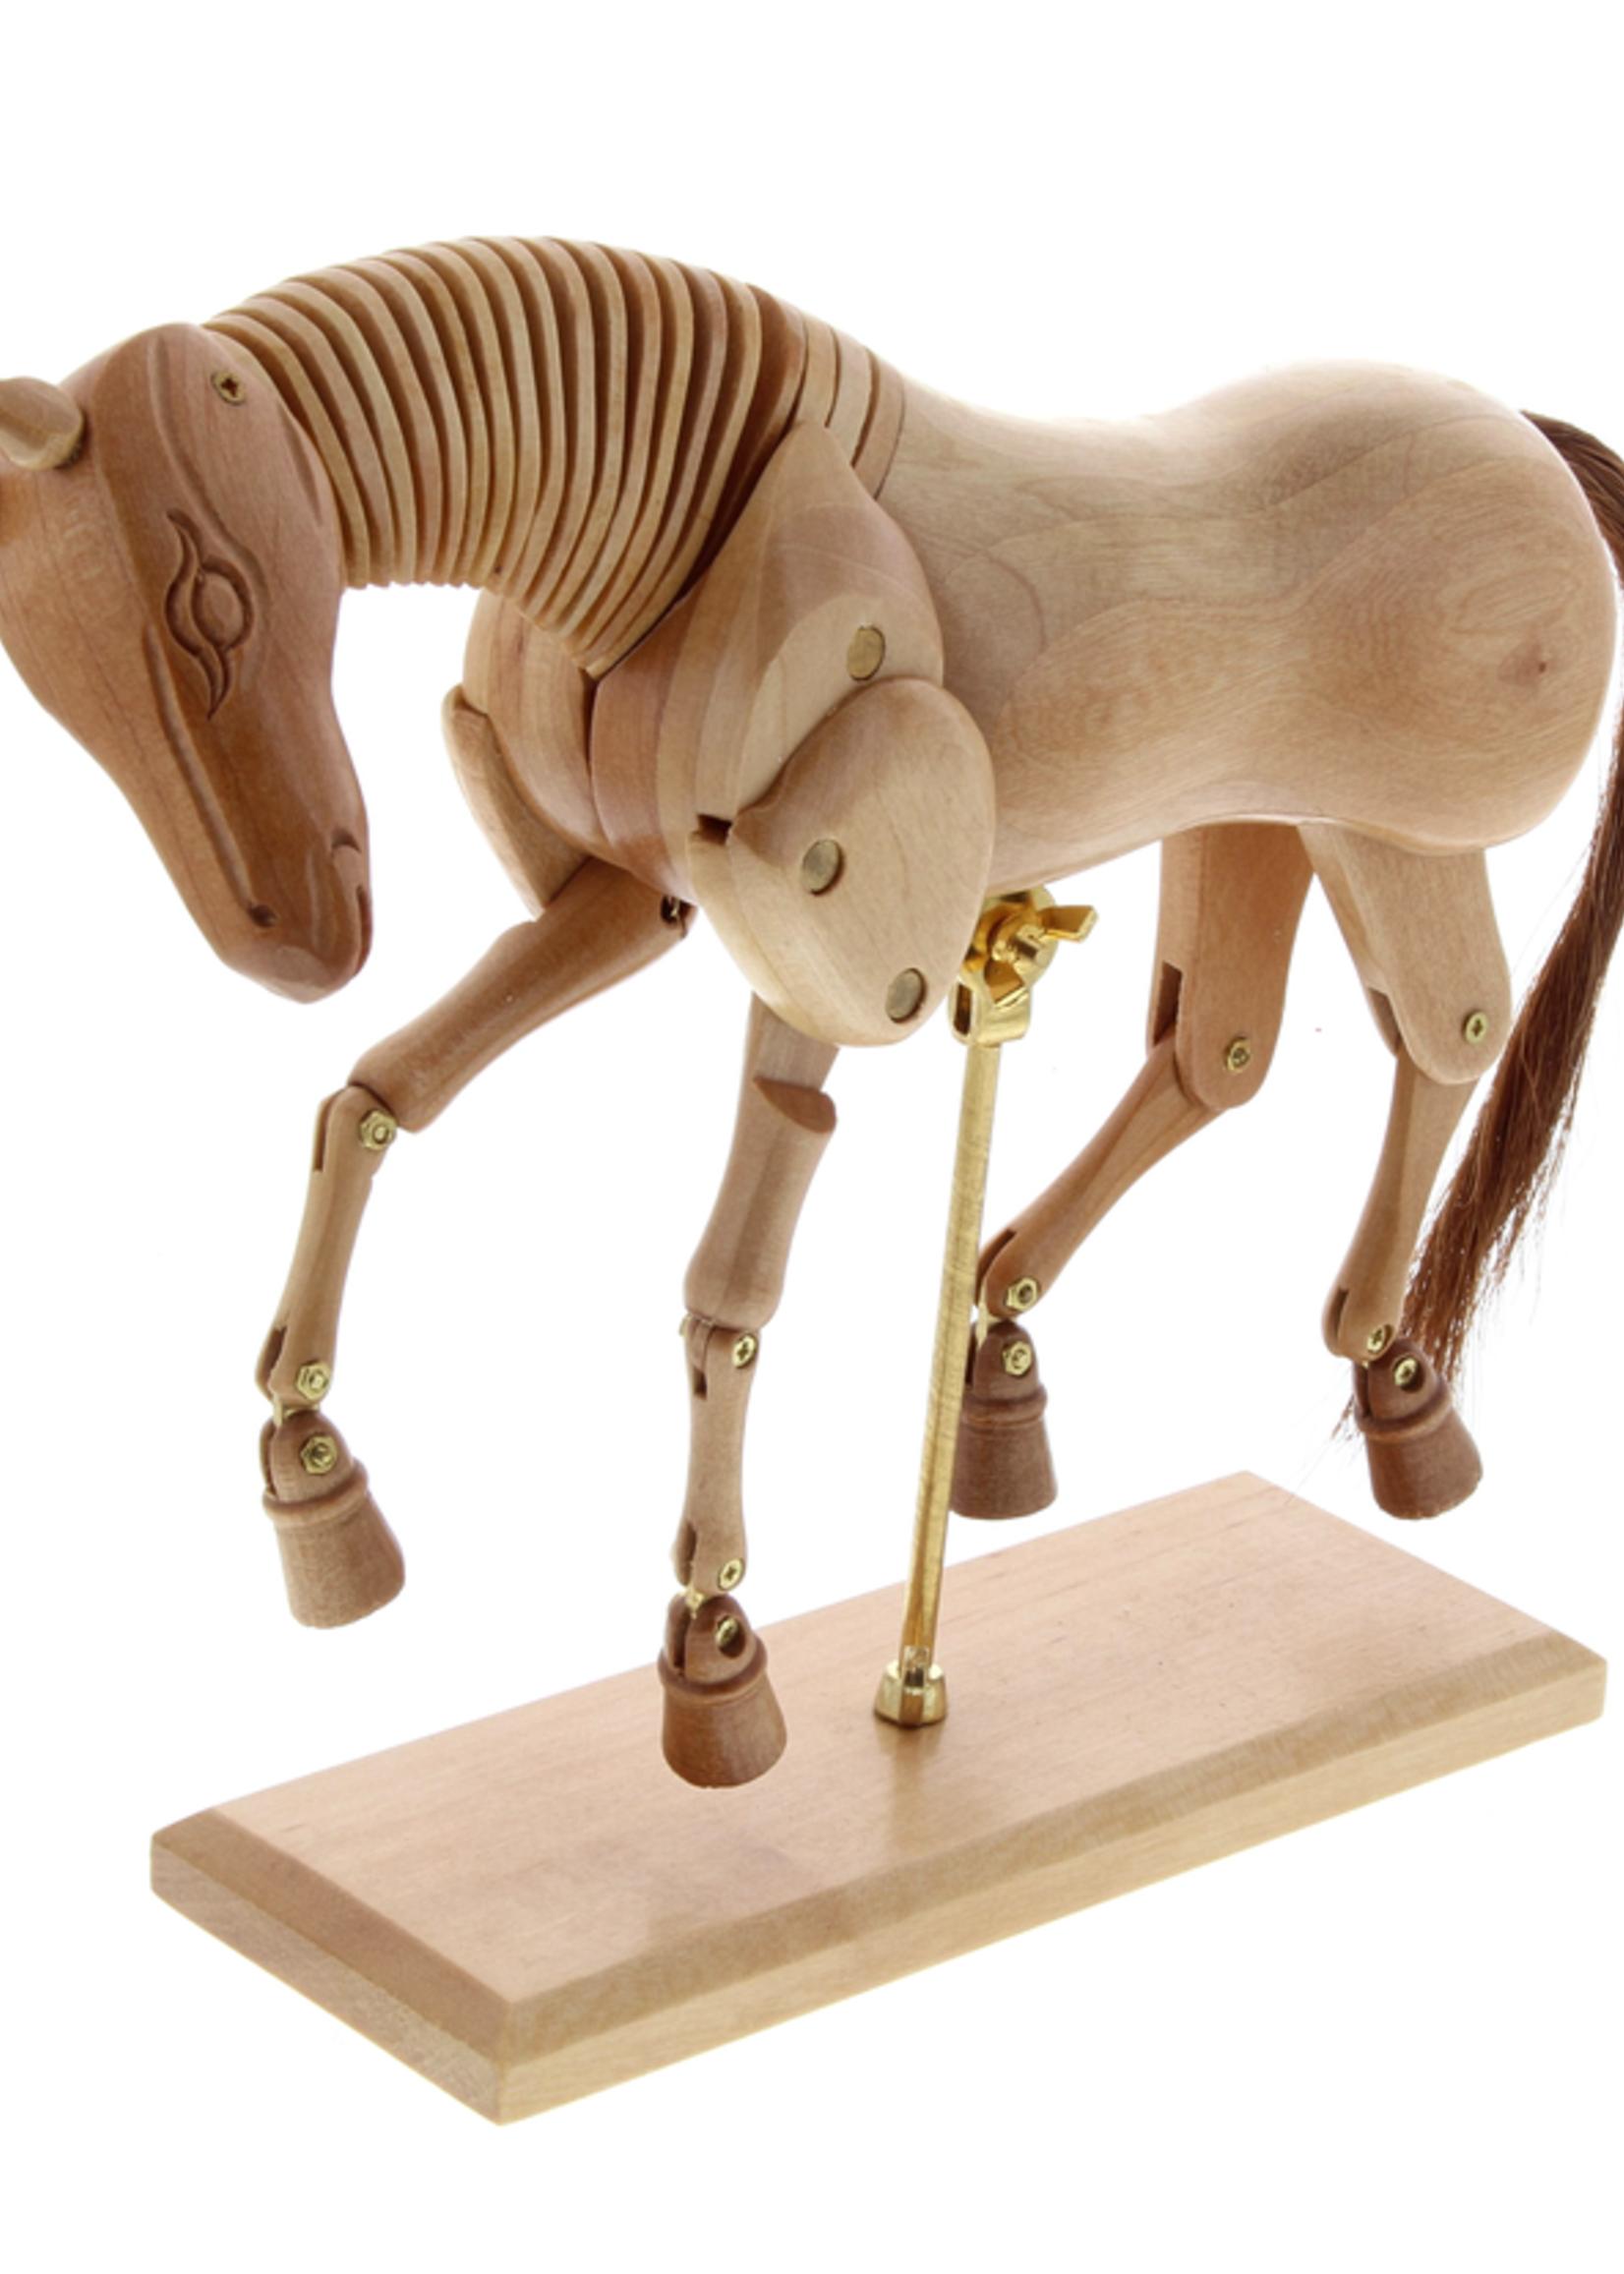 ART ALTERNATIVES MANIKIN HORSE 8 IN